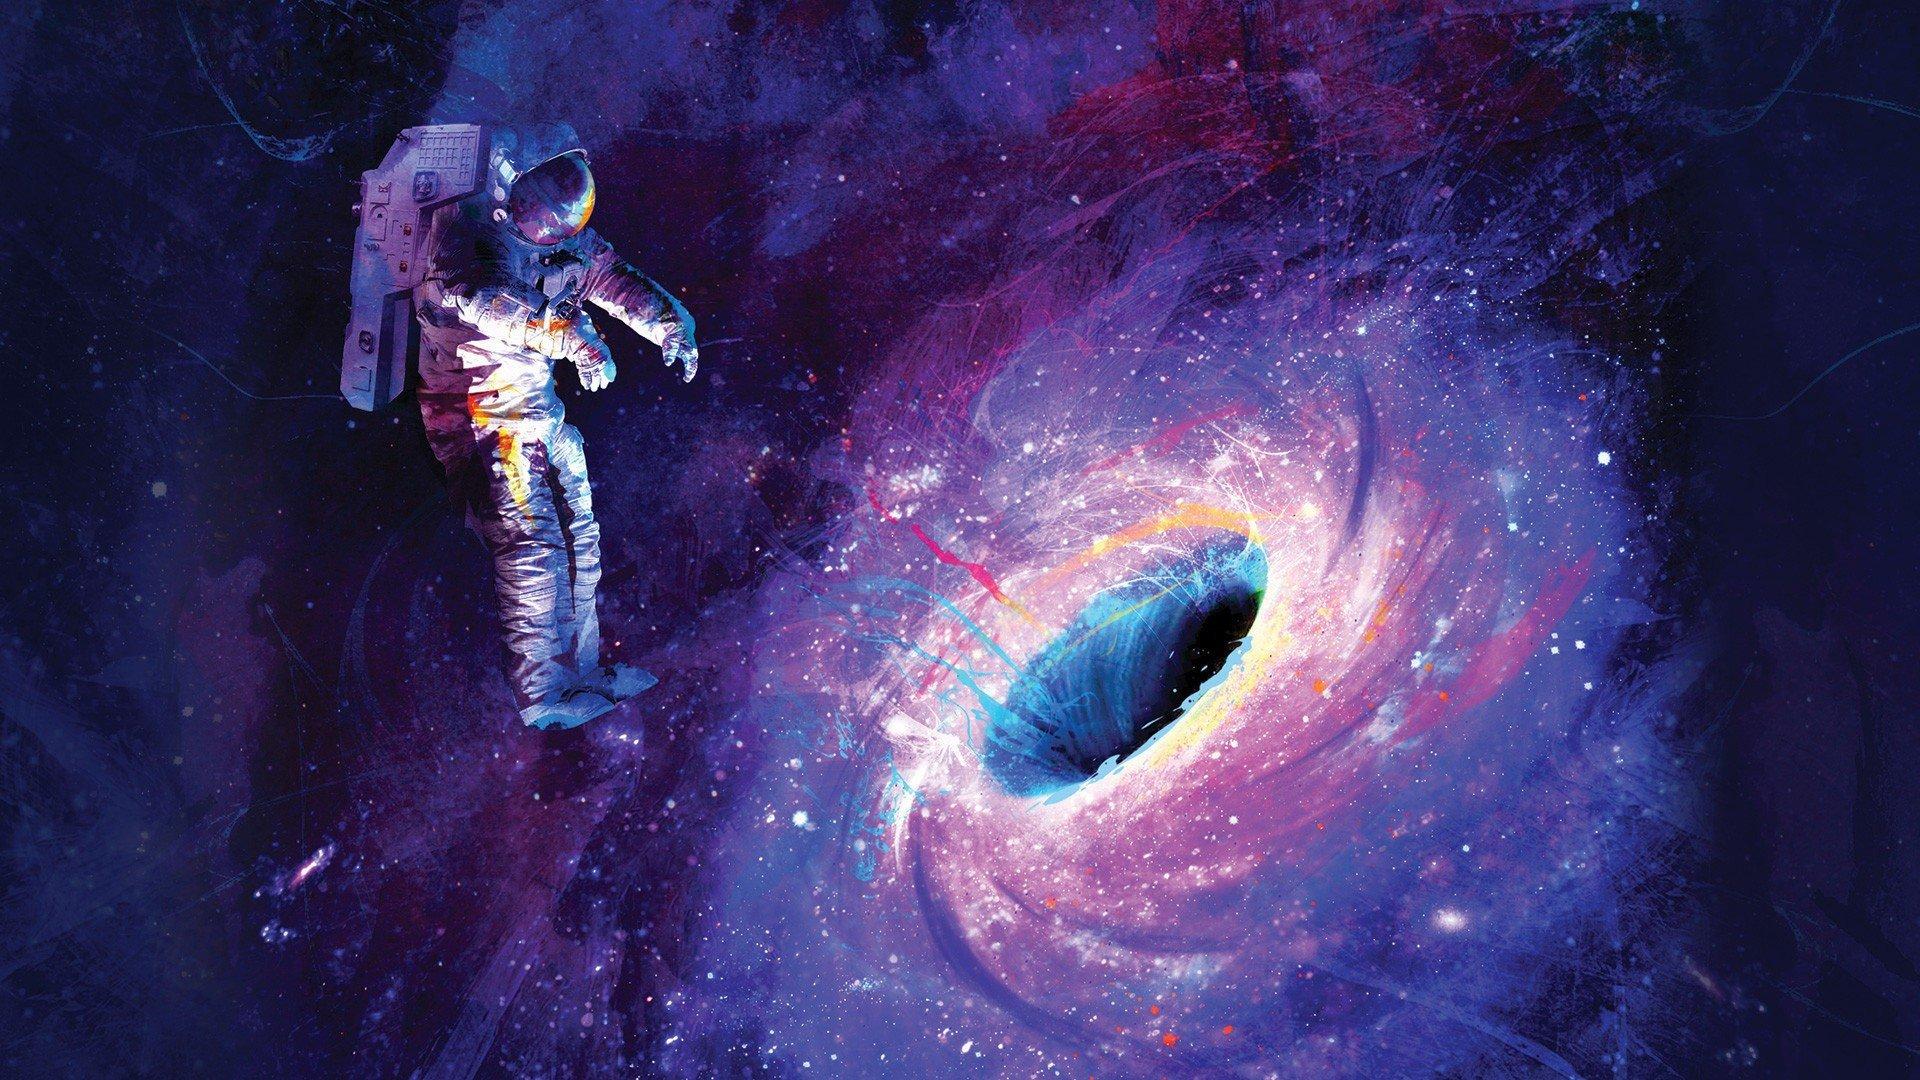 Astronaut Universe Black Holes Hd Wallpapers Desktop And Mobile Images Photos